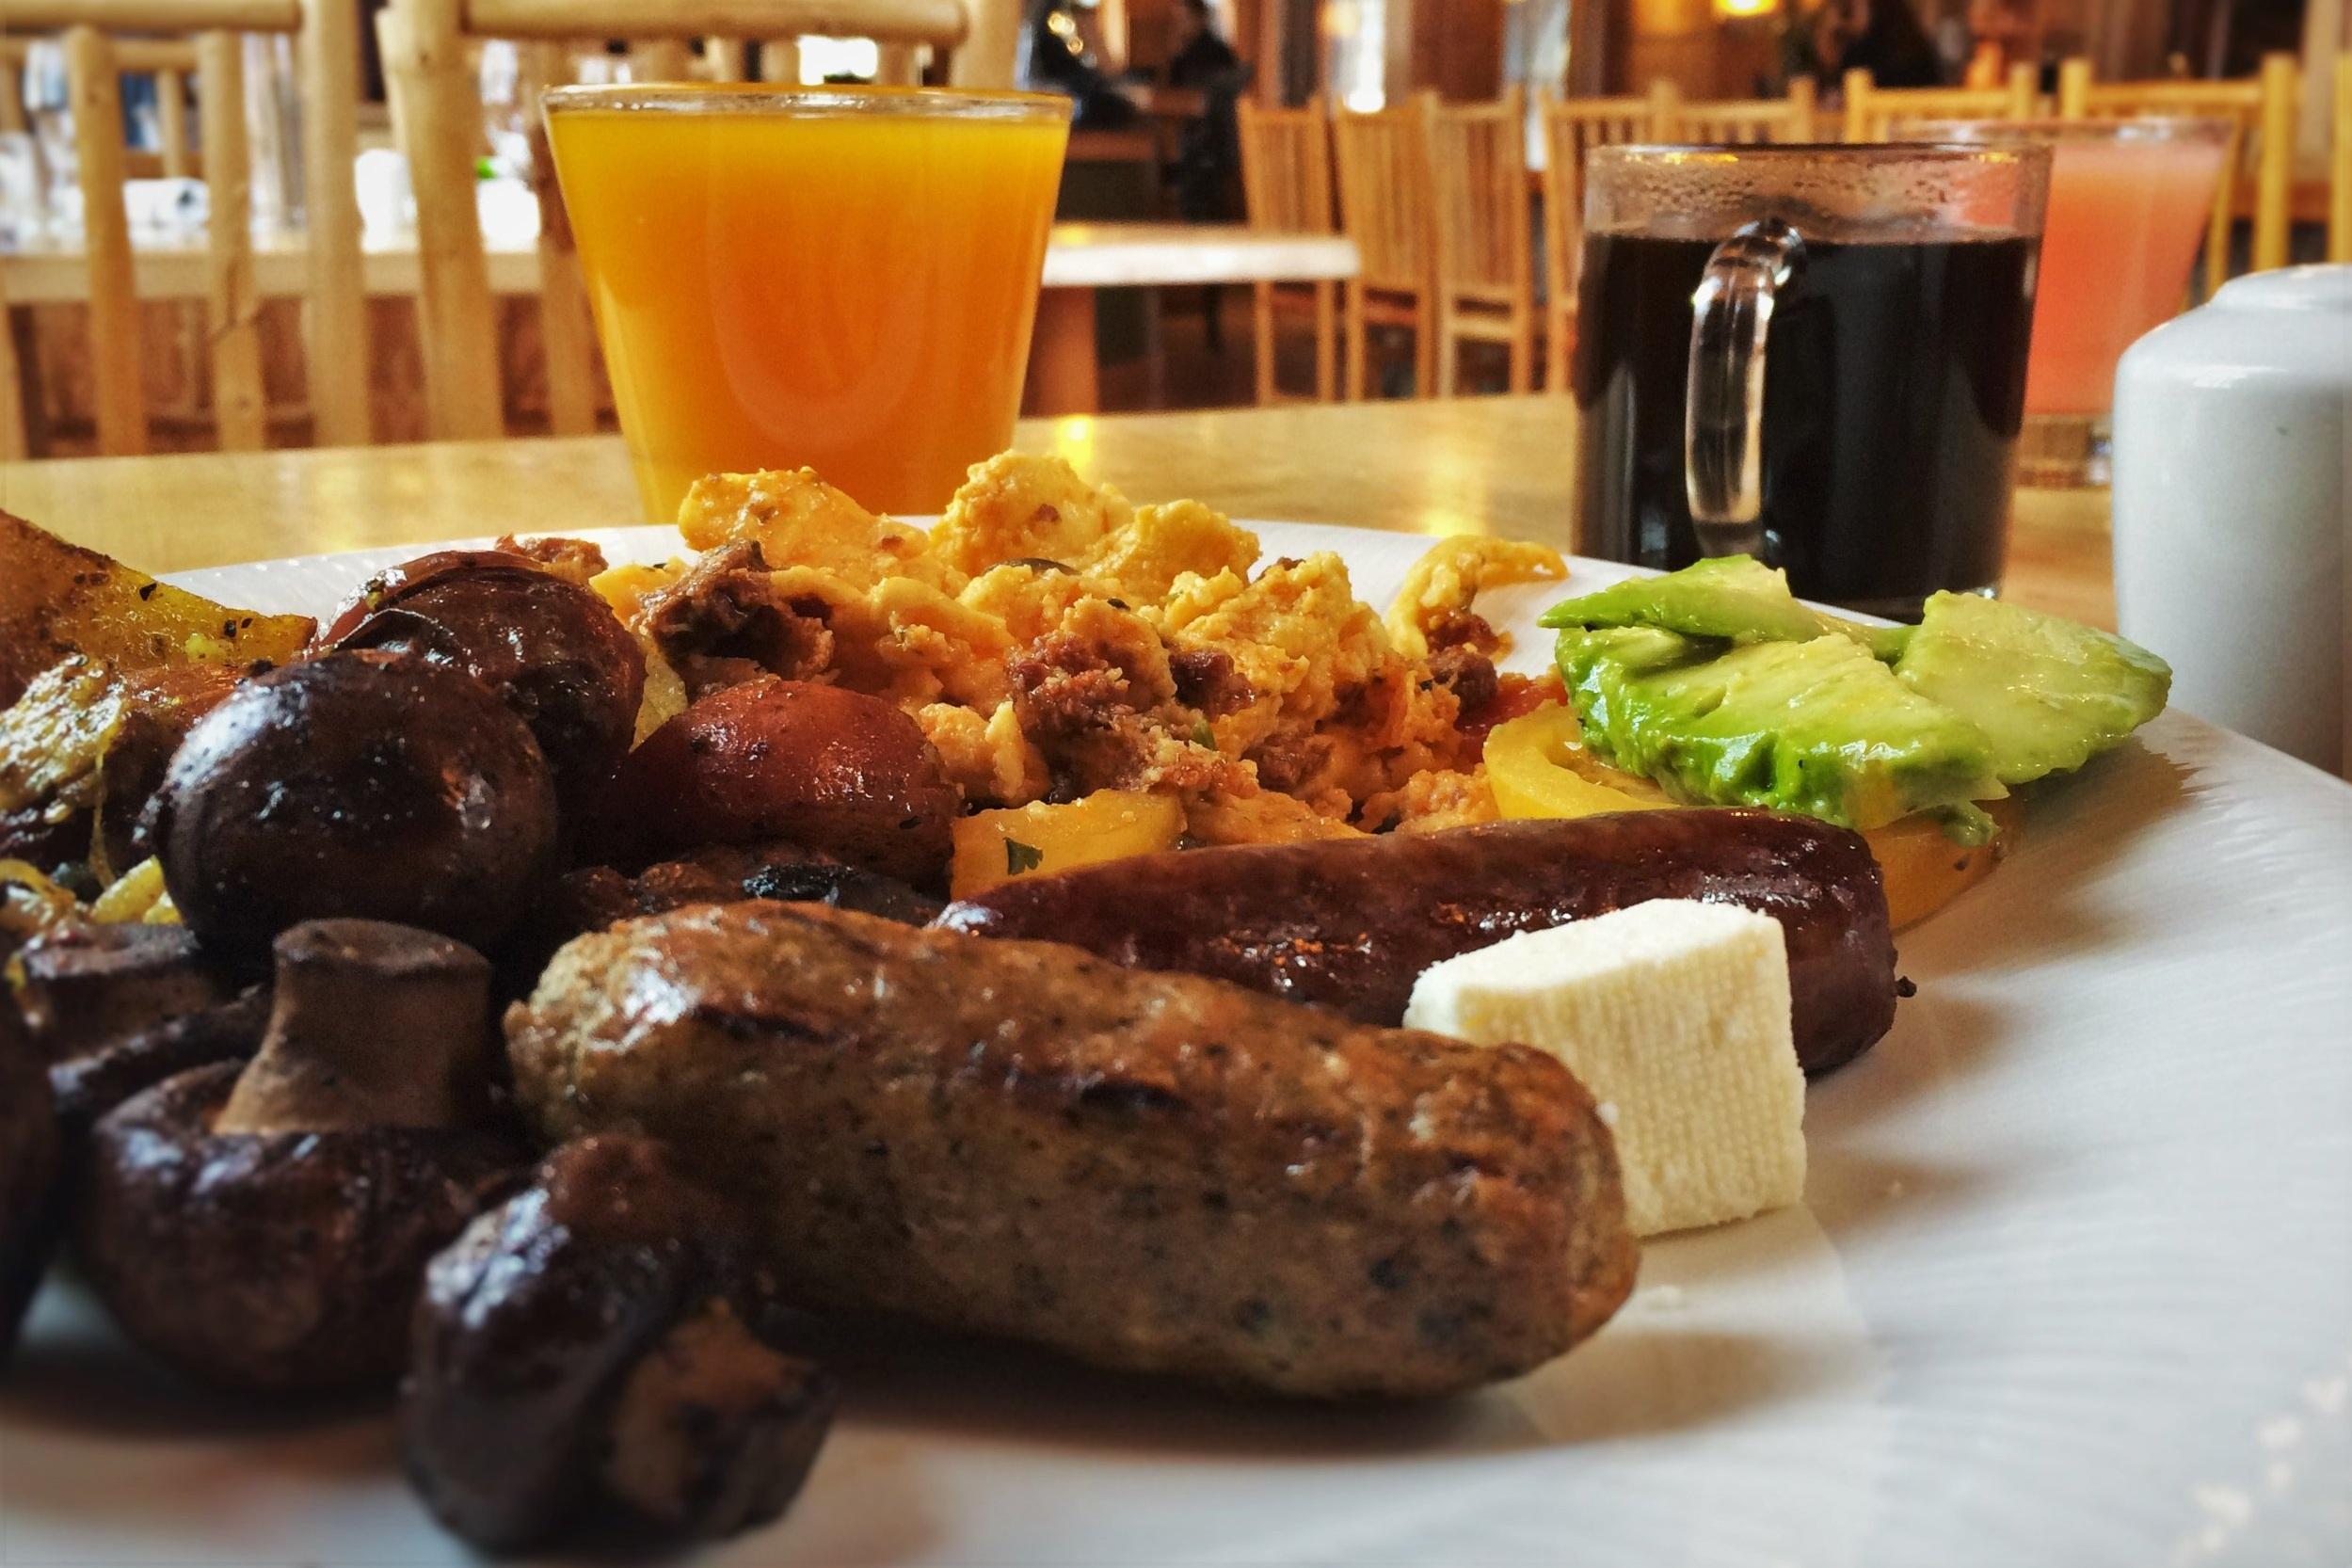 Breakfast-in-Kingfisher-Dining-Room-at-Sleeping-Lady-Resort-Leavenworth-WA-1.jpg